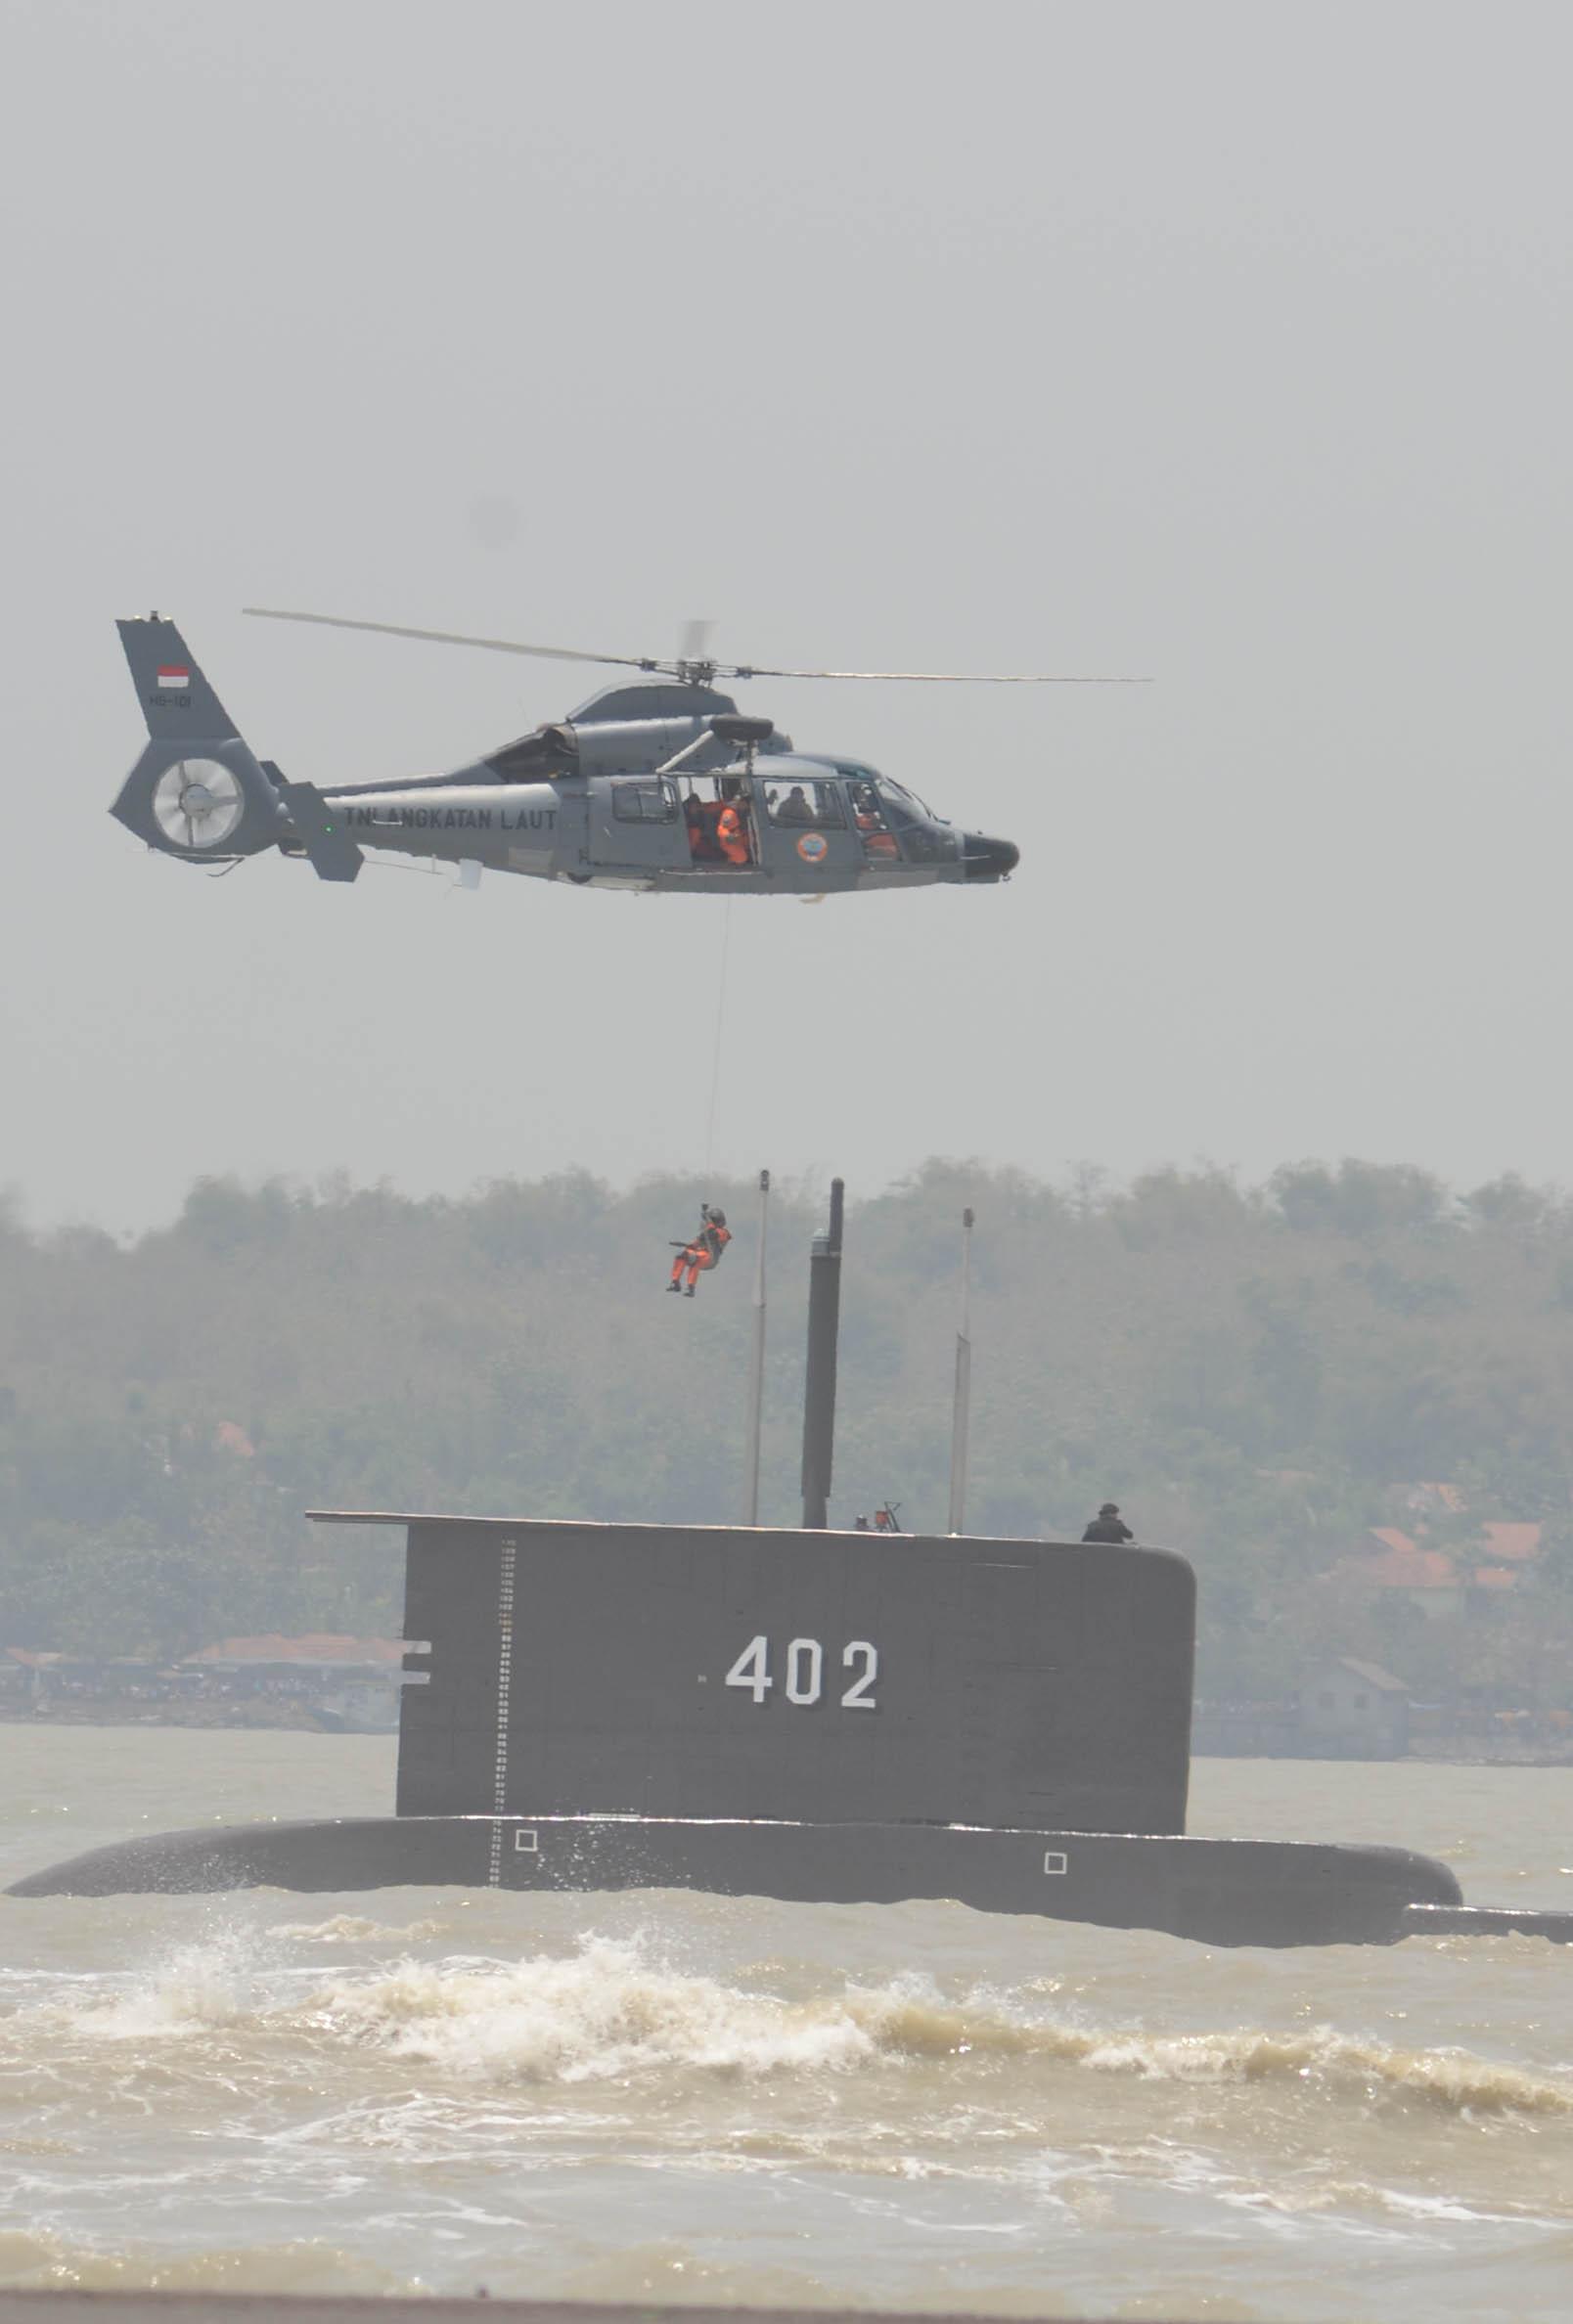 Seorang anggota Tentara Nasional Indonesia (TNI) melakukan fast rope di atas kapal selam KRI Nanggala-402 untuk menyelamatkan korban saat perayaan HUT Ke-69 TNI di Dermaga Ujung, Koarmatim, Surabaya, Selasa (7/10/2014). Peringatan terbesar sepanjang sejarah TNI tersebut mengambil tema Patriot Sejati, Profesional, dan Dicintai Rakyat. SURYA/AHMAD ZAIMUL HAQ